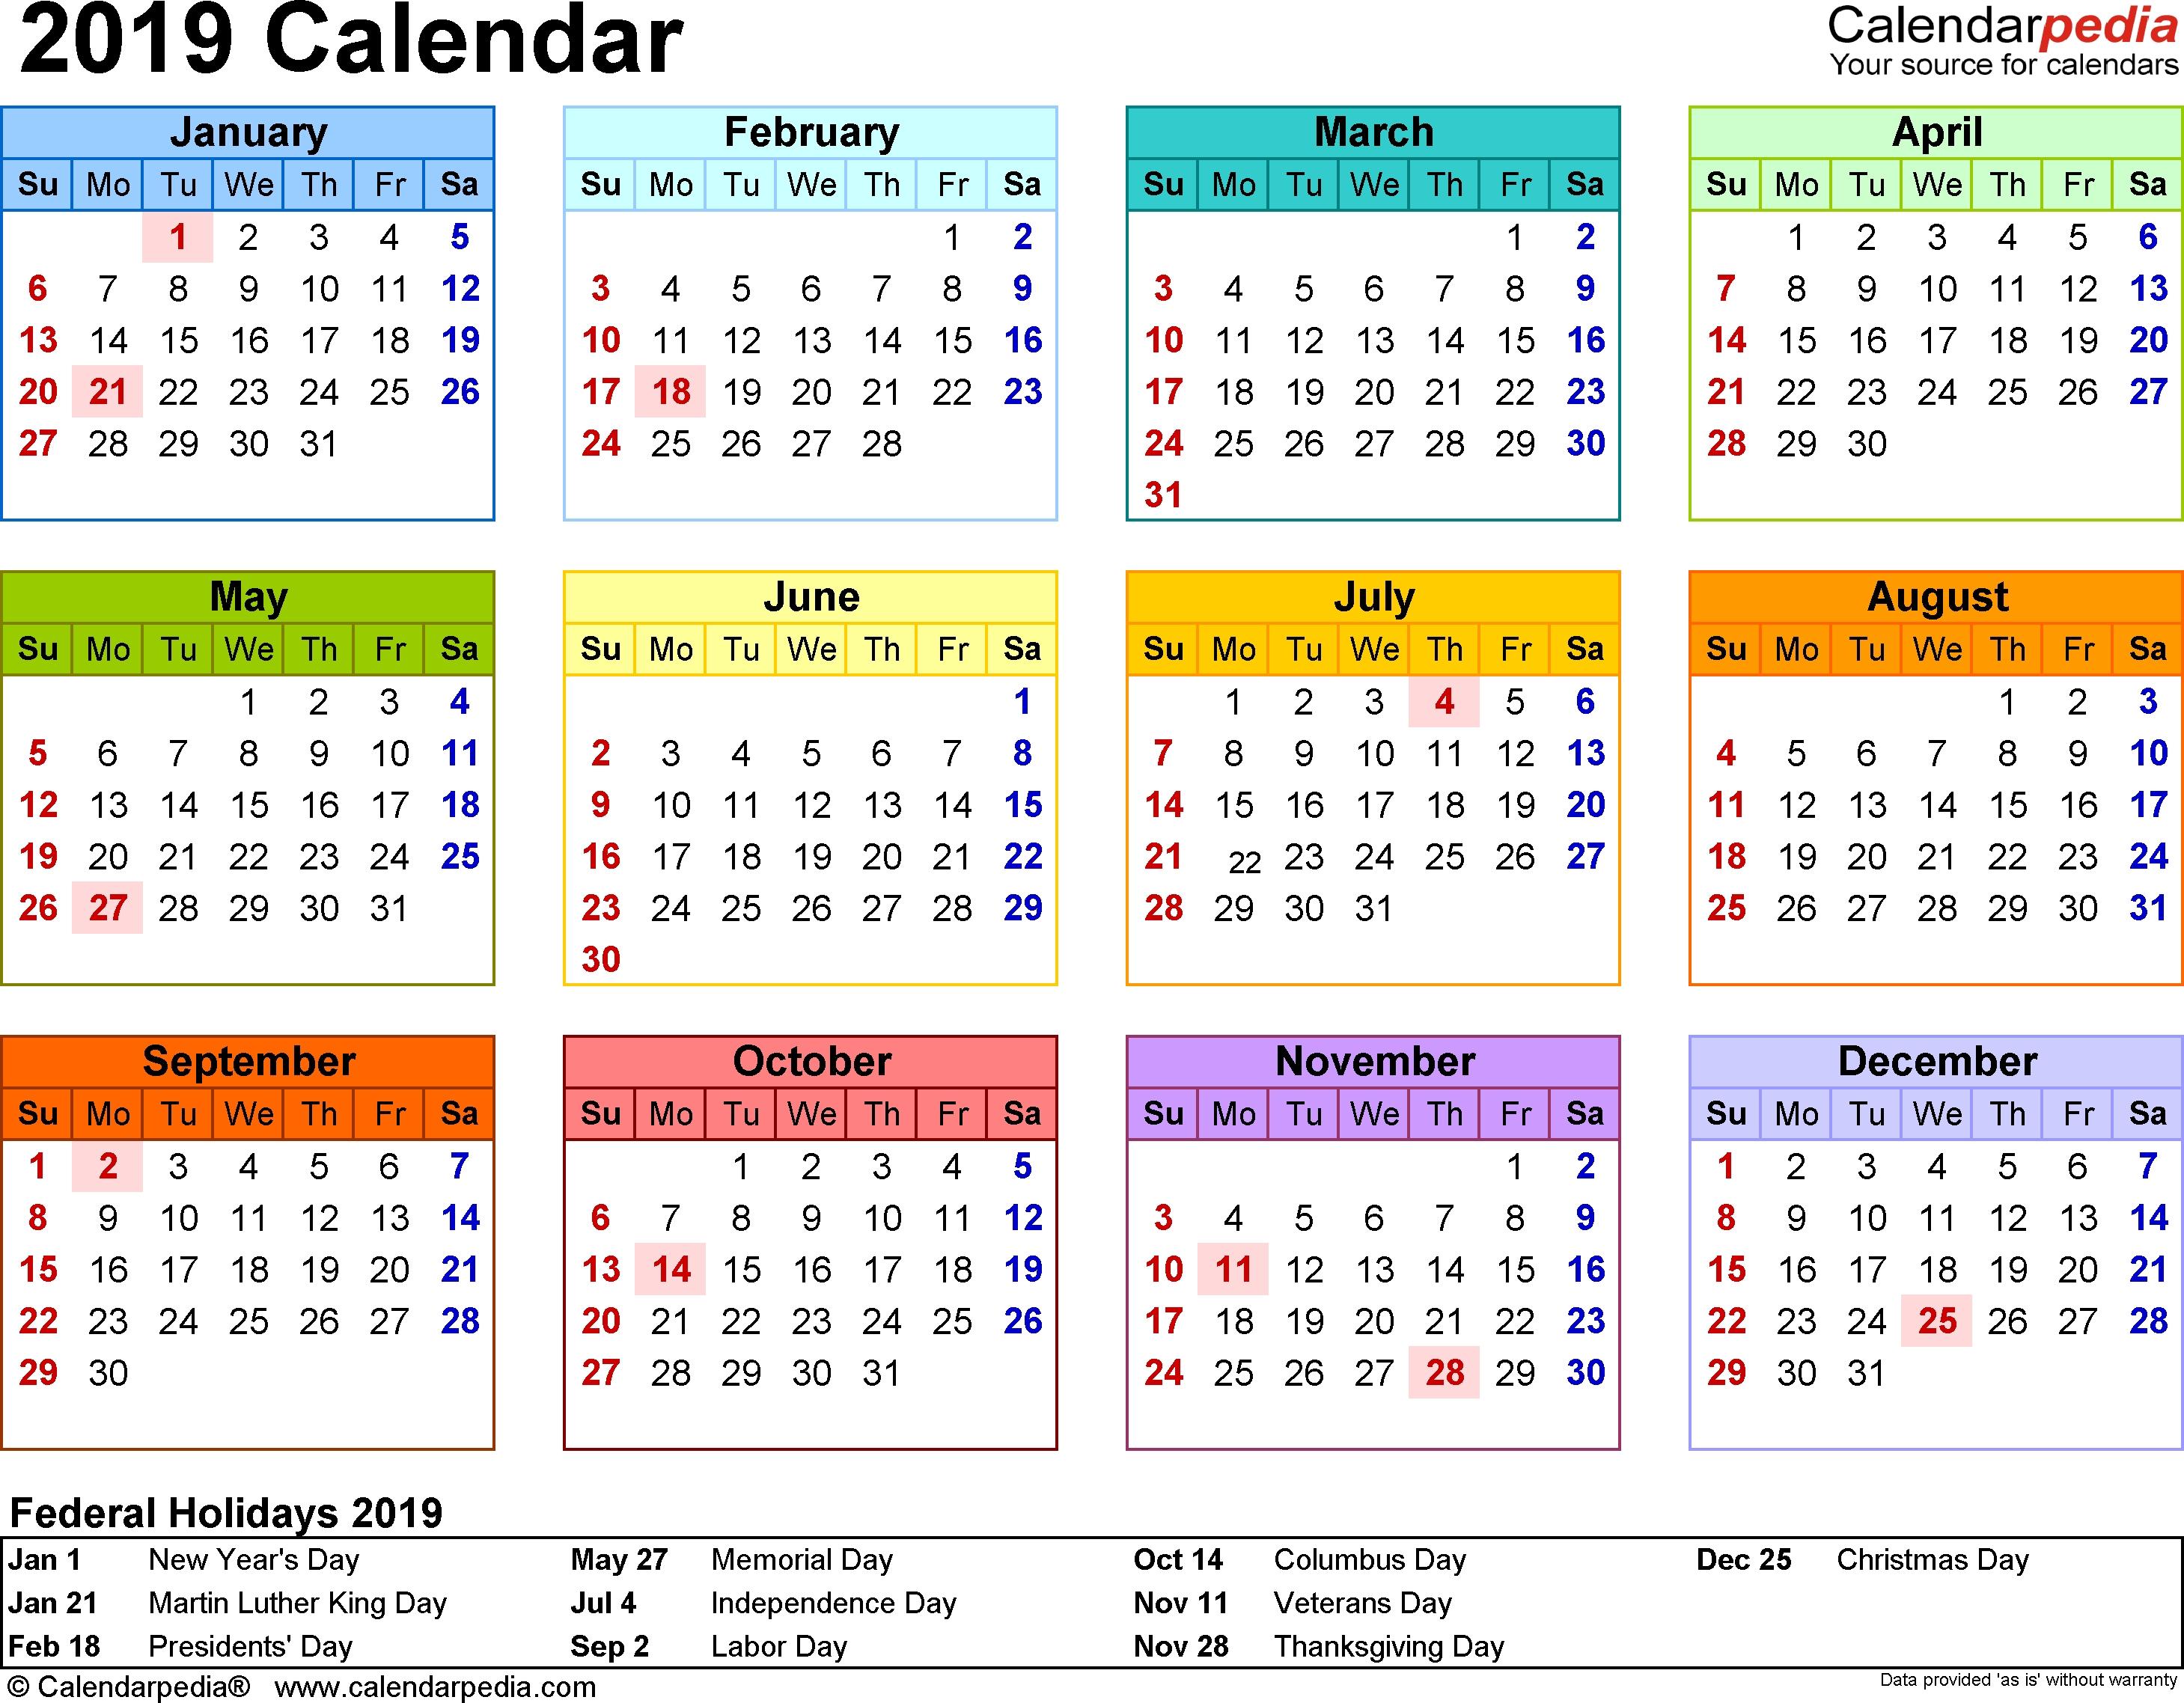 2019 Calendar Pdf - 17 Free Printable Calendar Templates within Blank Year At A Glance Calendar Template